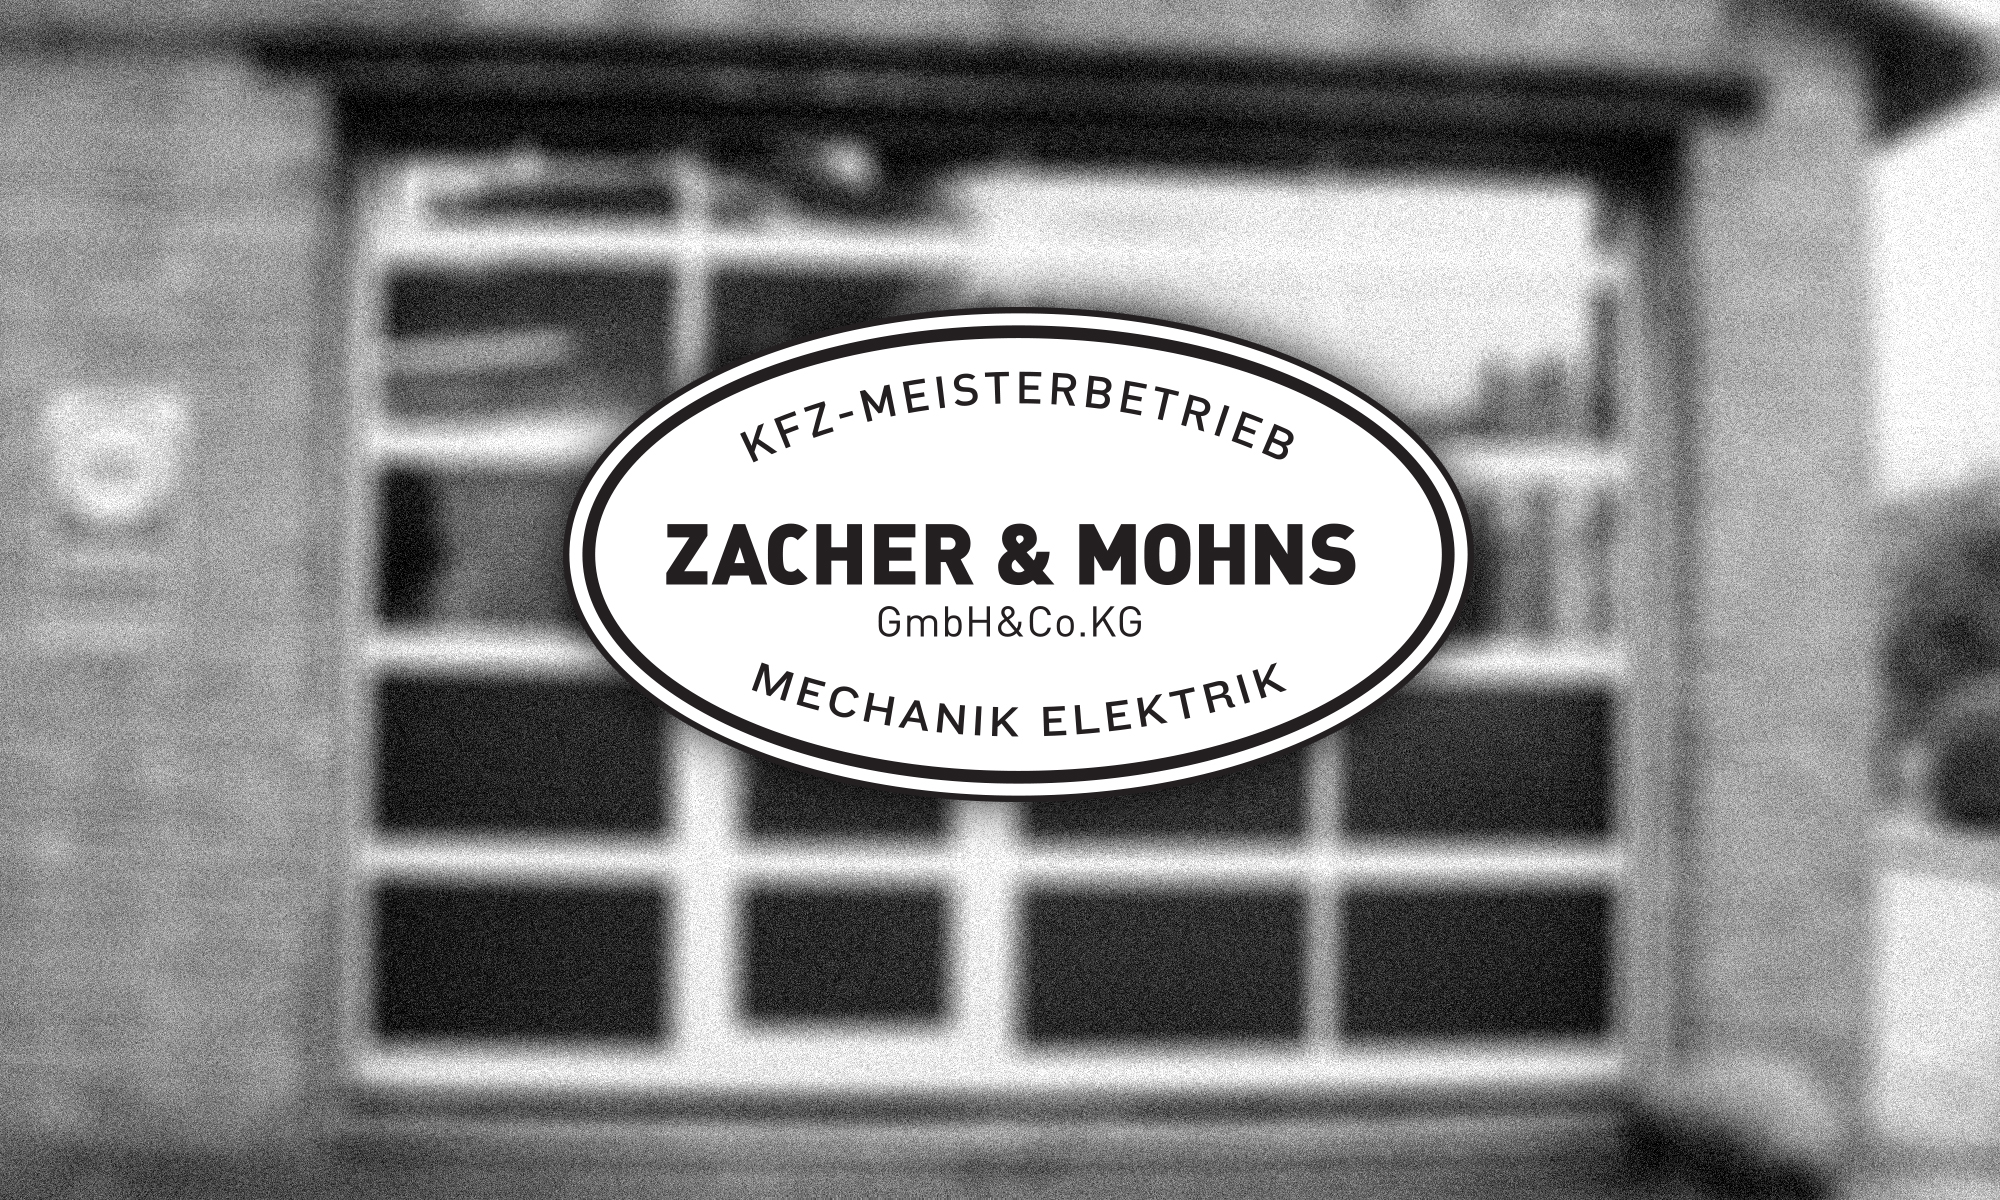 Zacher & Mohns